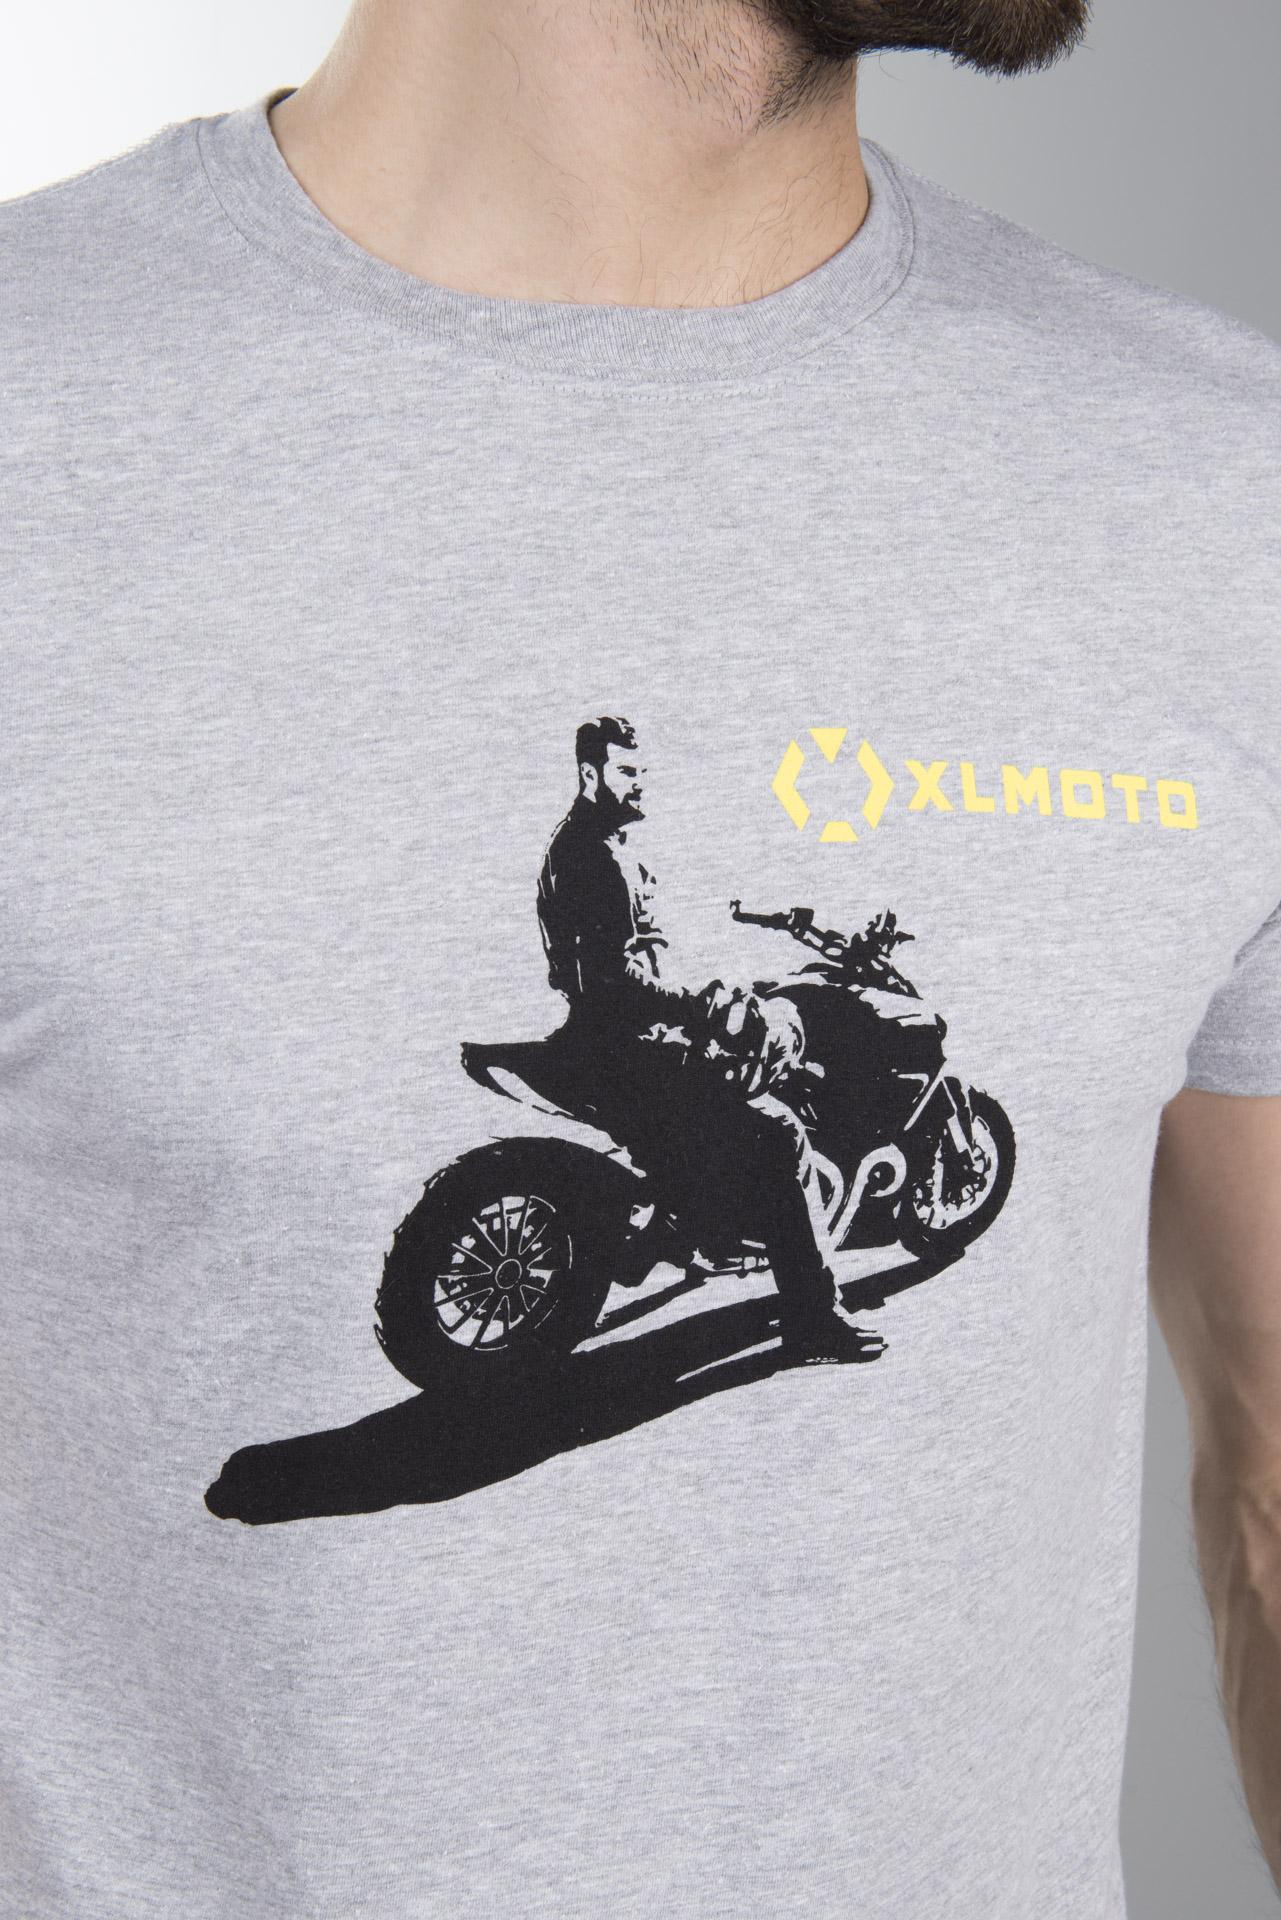 T Skjorte XLMOTO Rider Grå Nå 59% Du sparer XLmoto.no